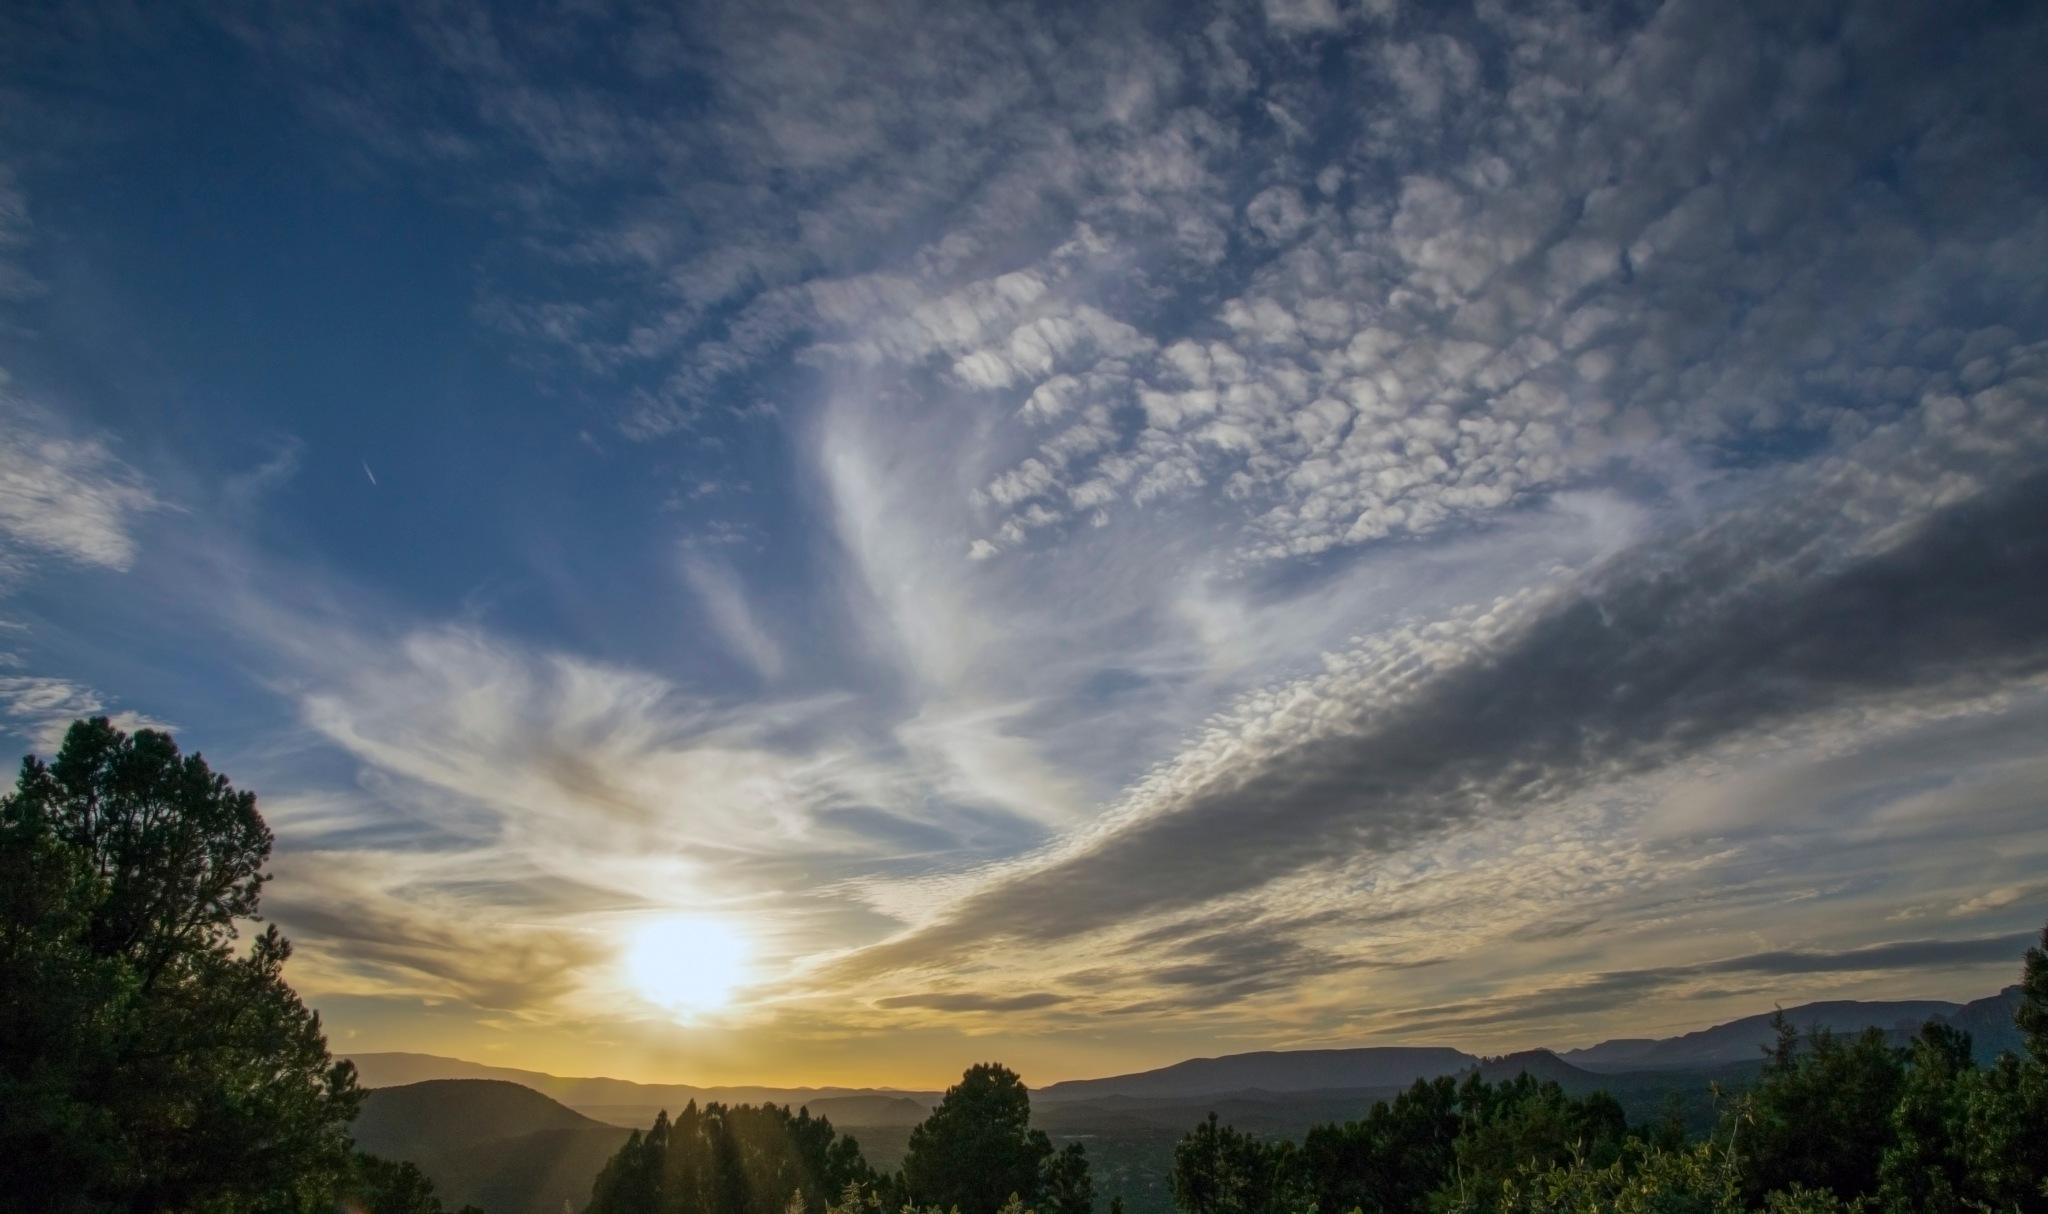 Sunset Sedona, Arizona by Patricia J. LaHaie